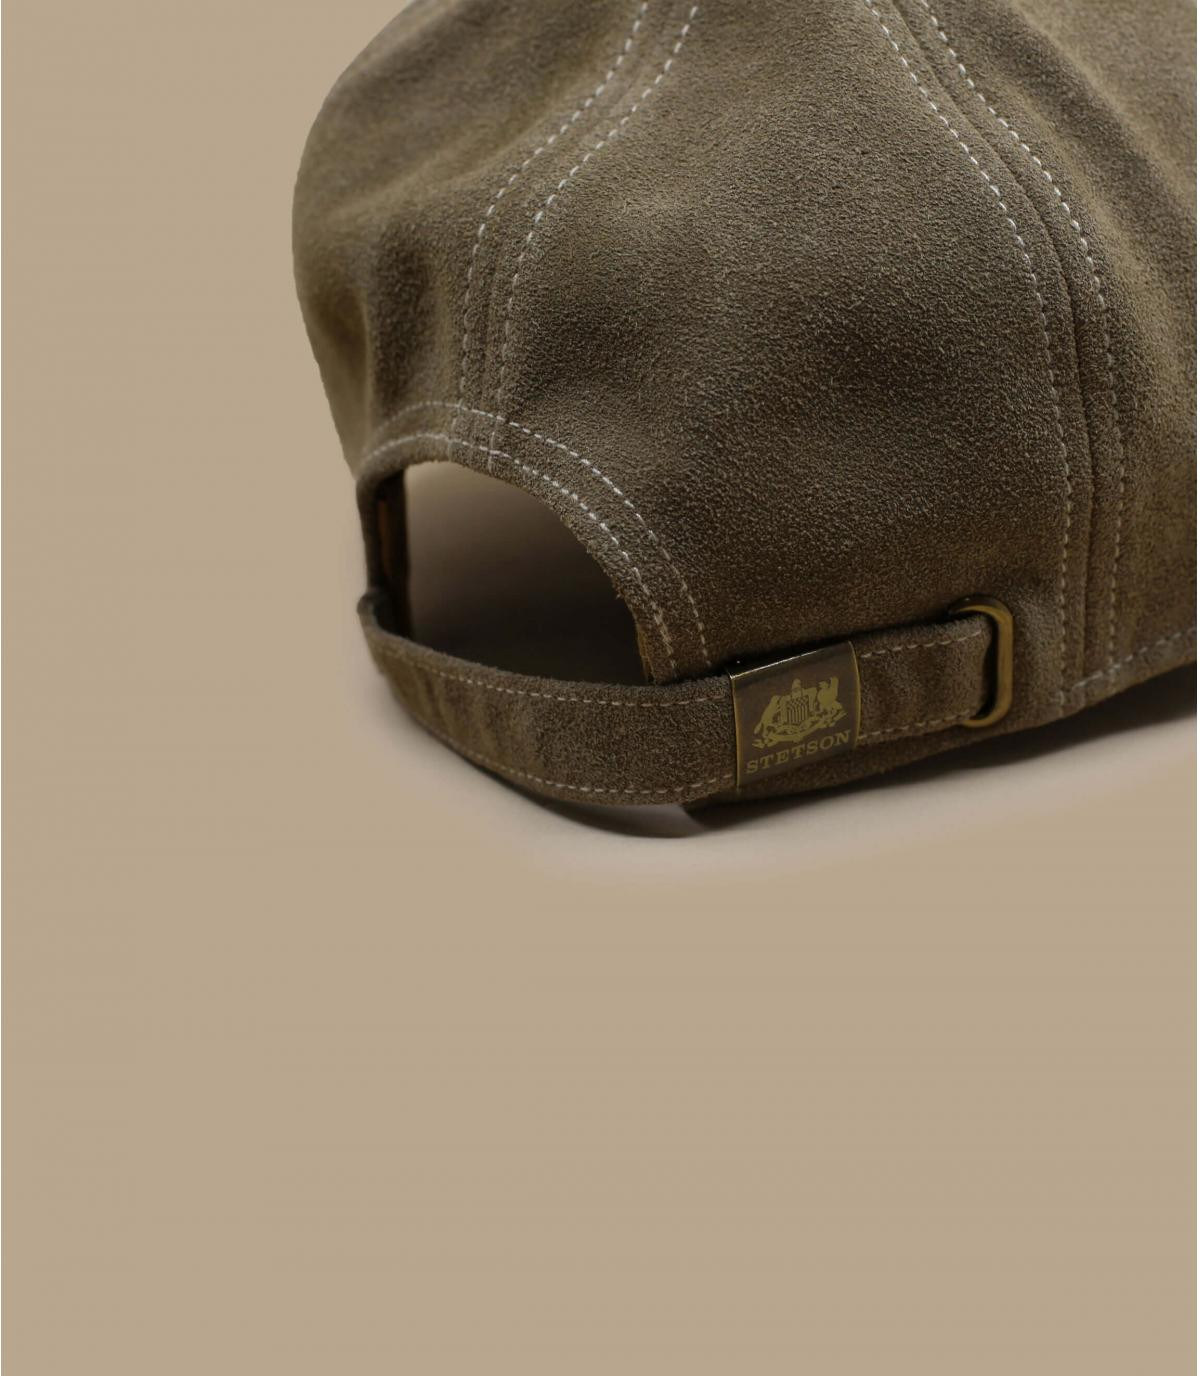 Detalles Baseball Cap Calf Leather imagen 4